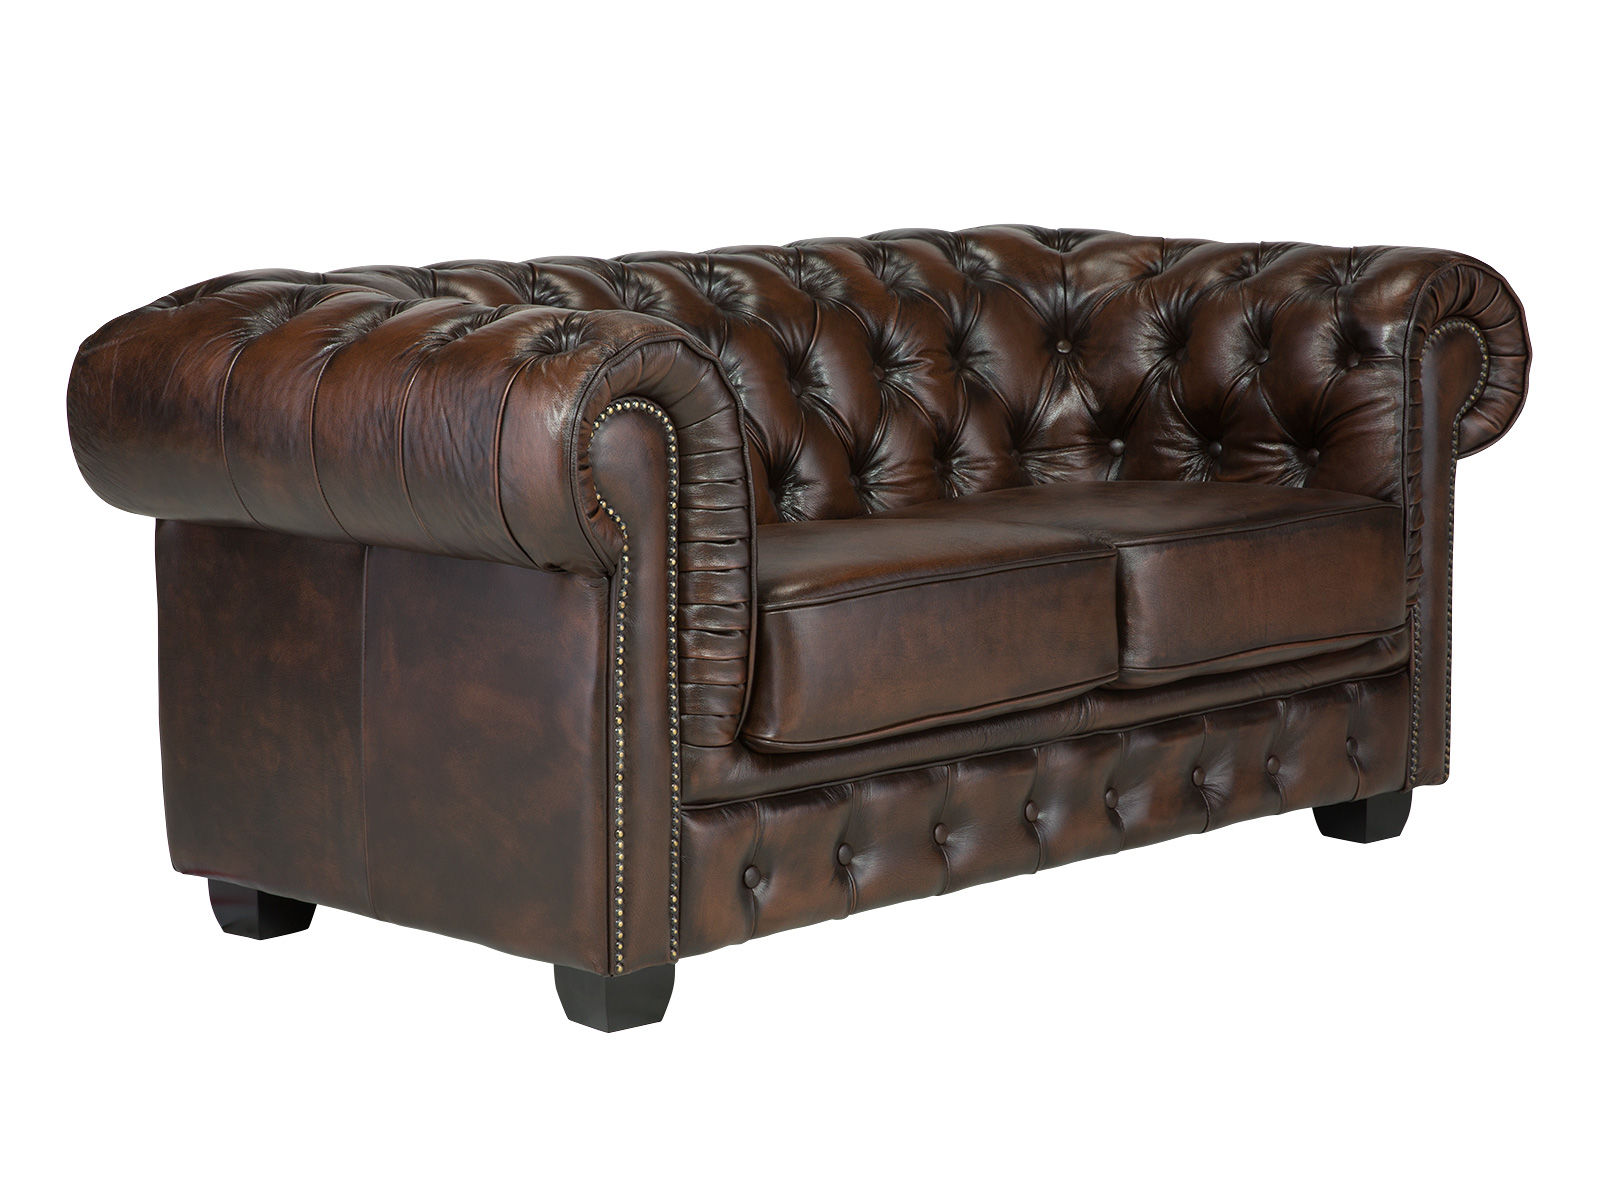 Sofa Chesterfield Big 2-Sitzer braun